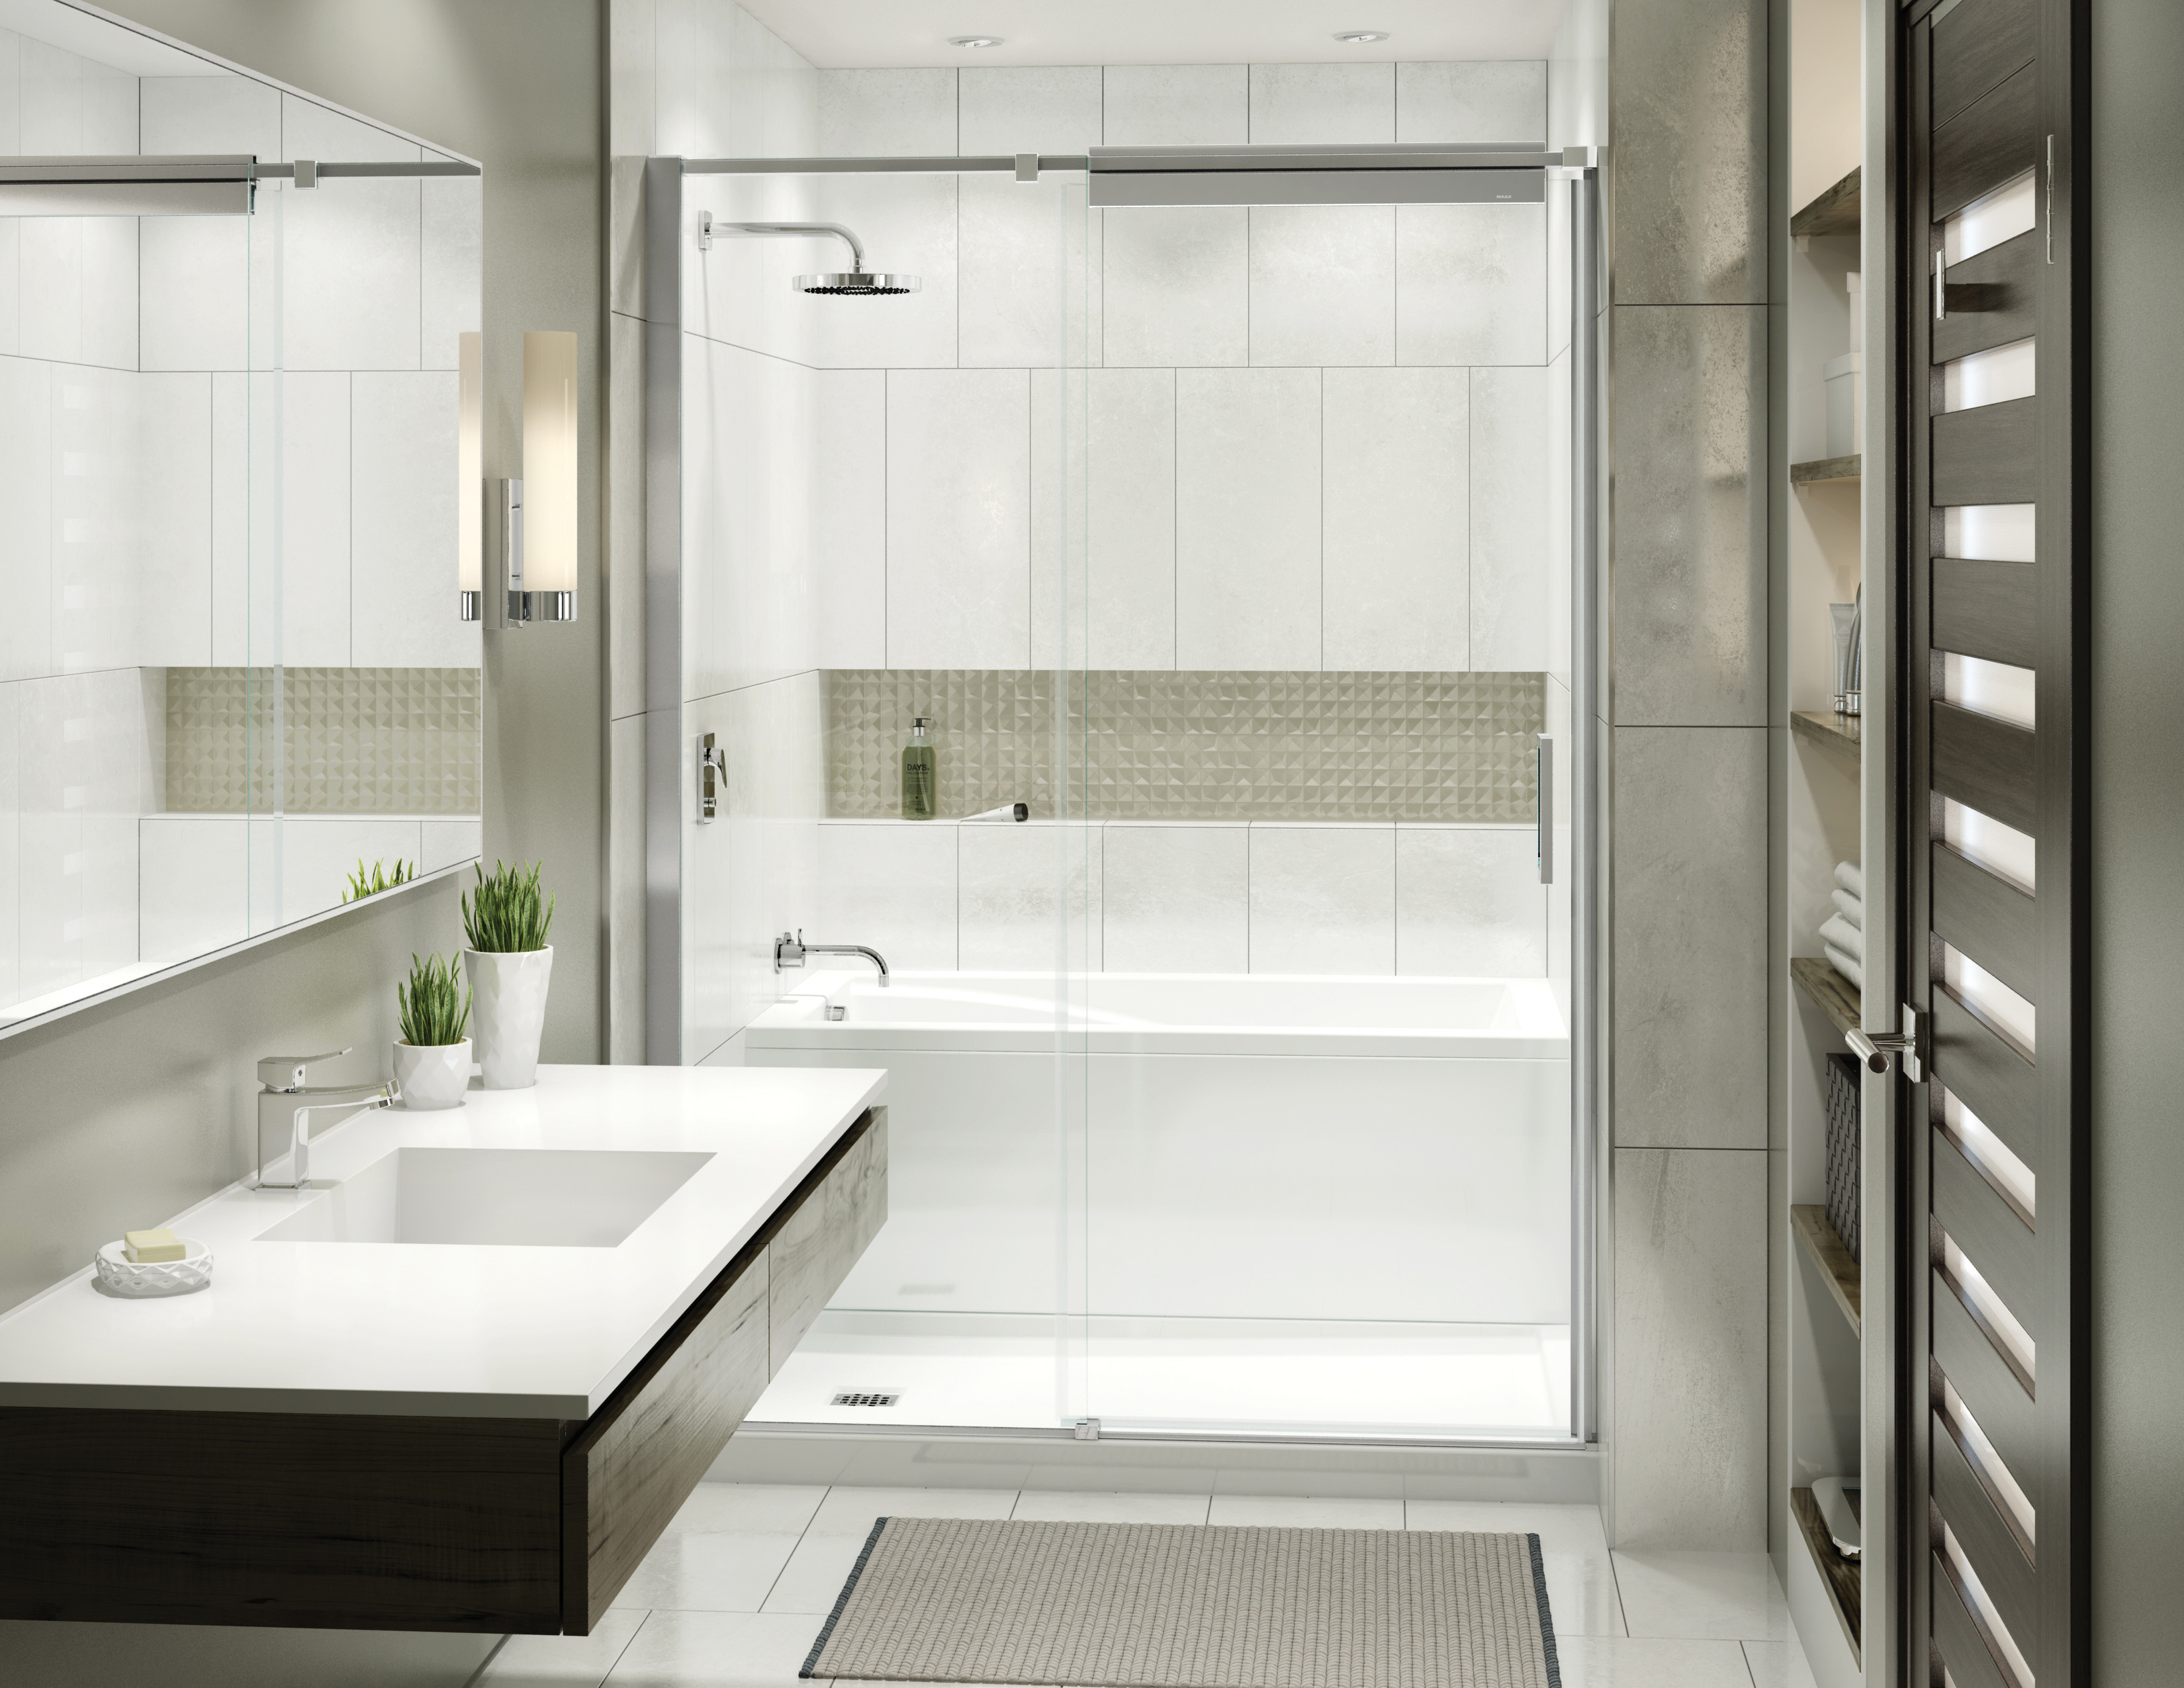 MAAX Bath Inc. Introduces Innovative Solutions for Baths, Showers ...